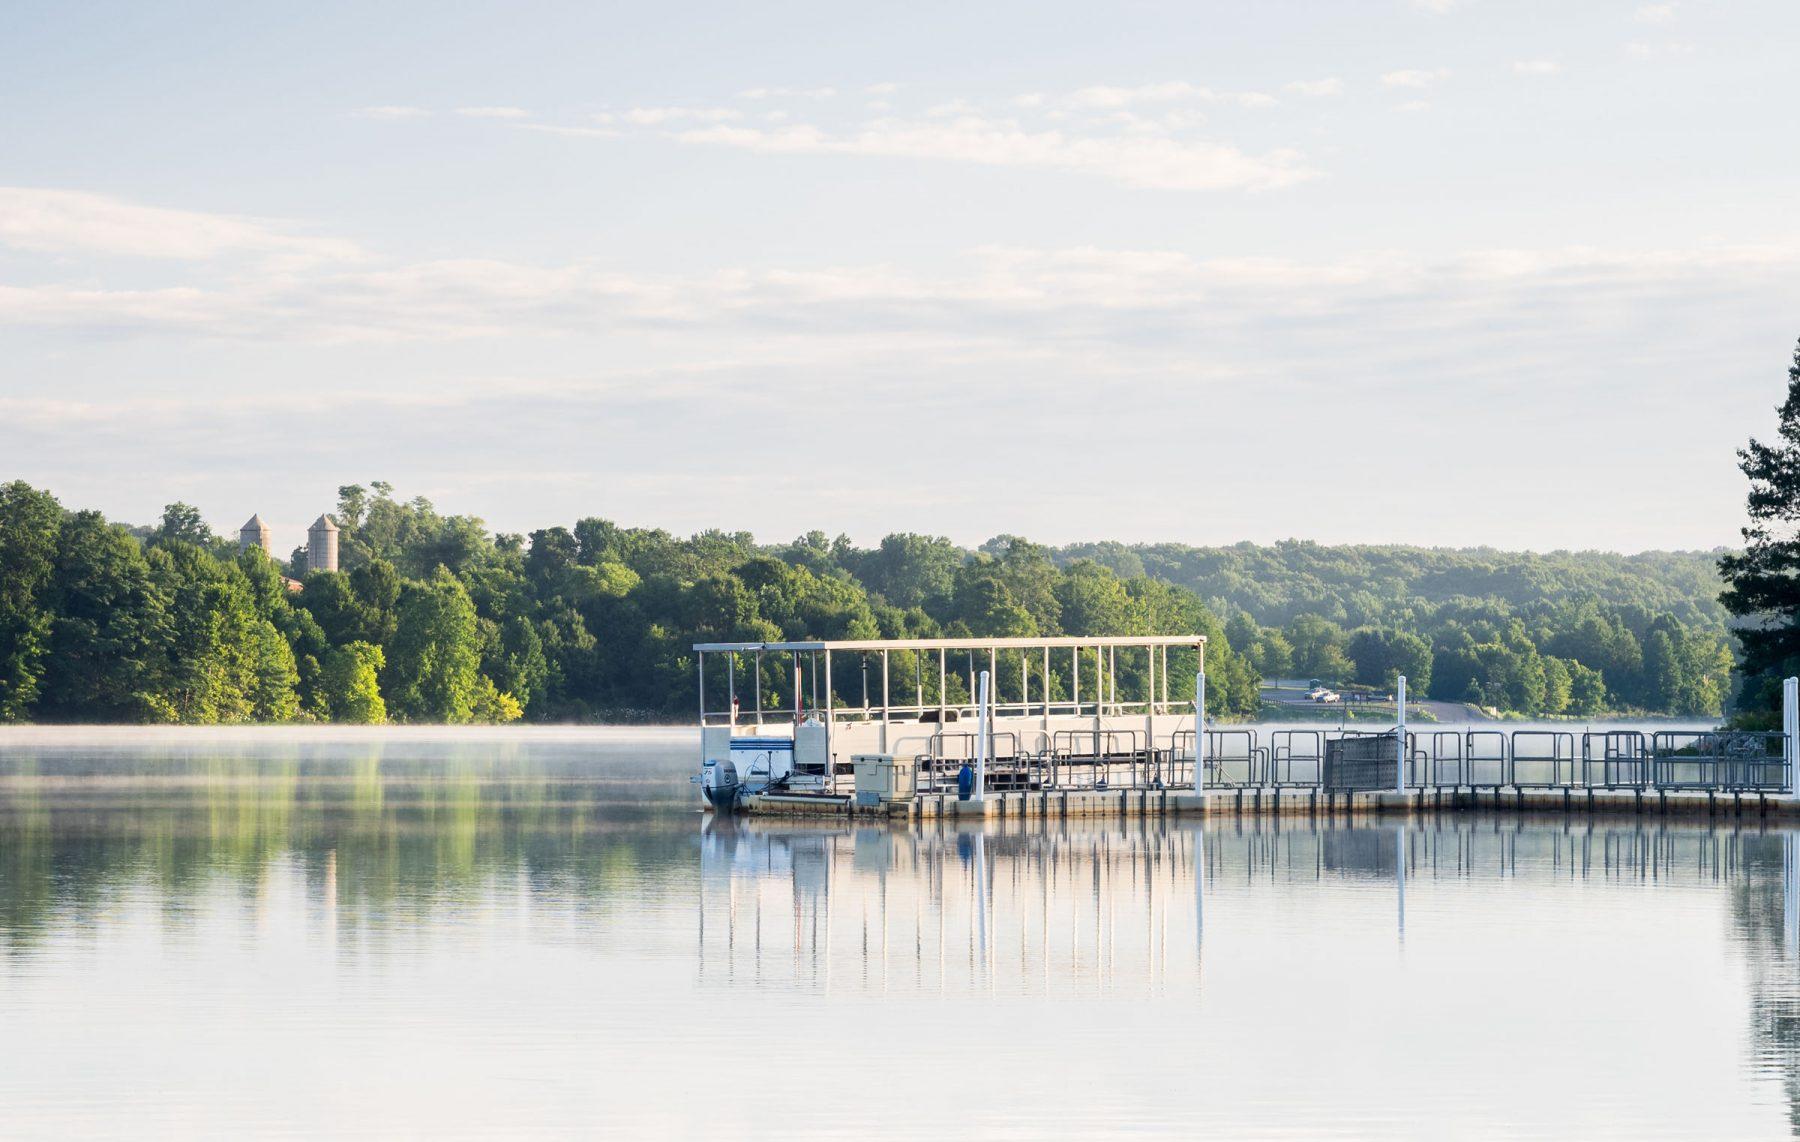 Additional Little Lake Seneca Boating Info